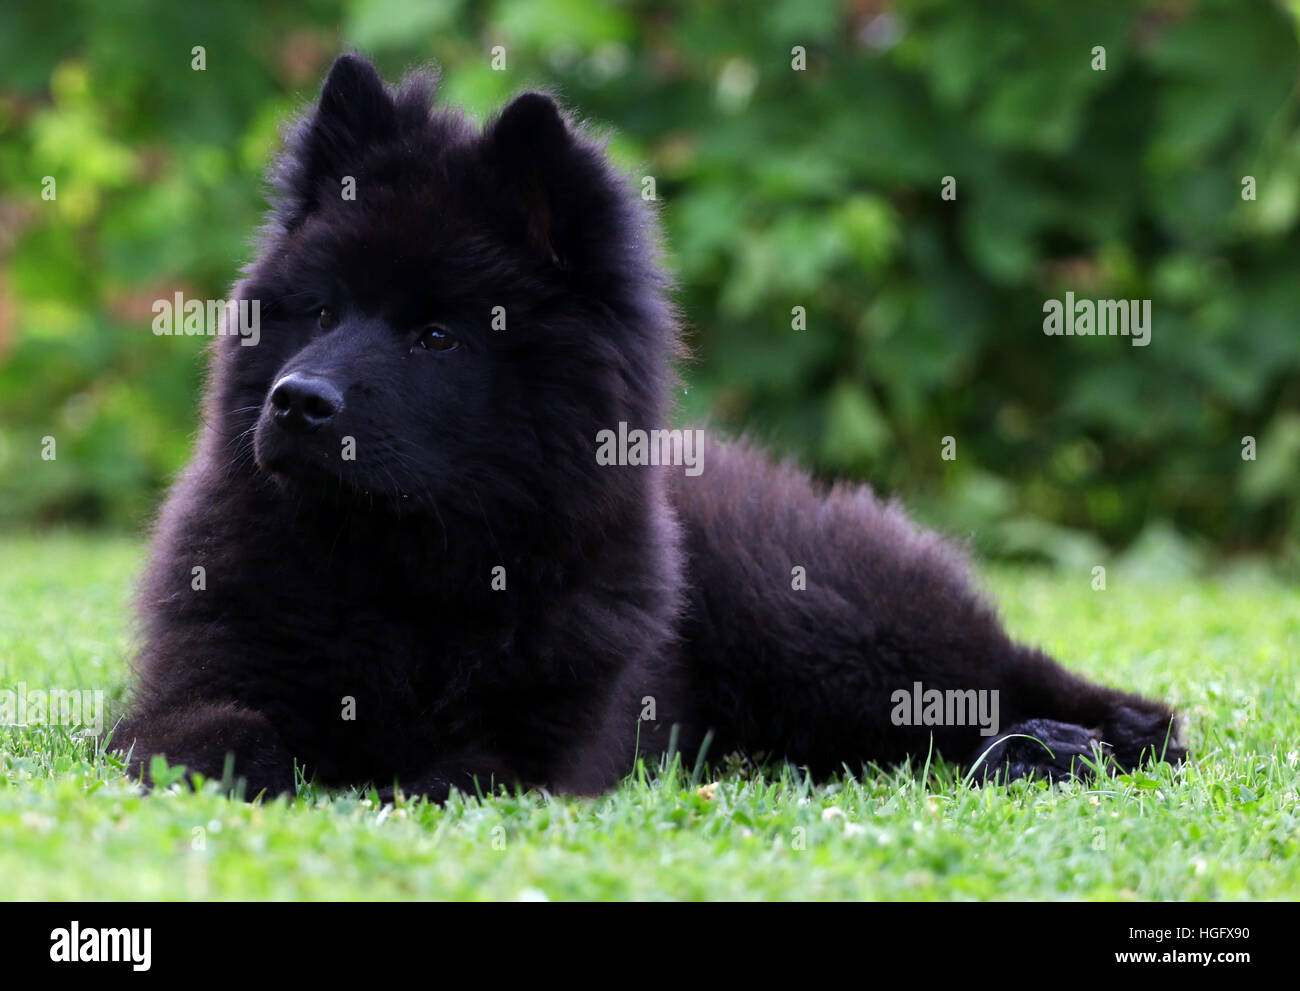 Black Eurasier Puppy Dog Lying On The Grass Stock Photo 130656988